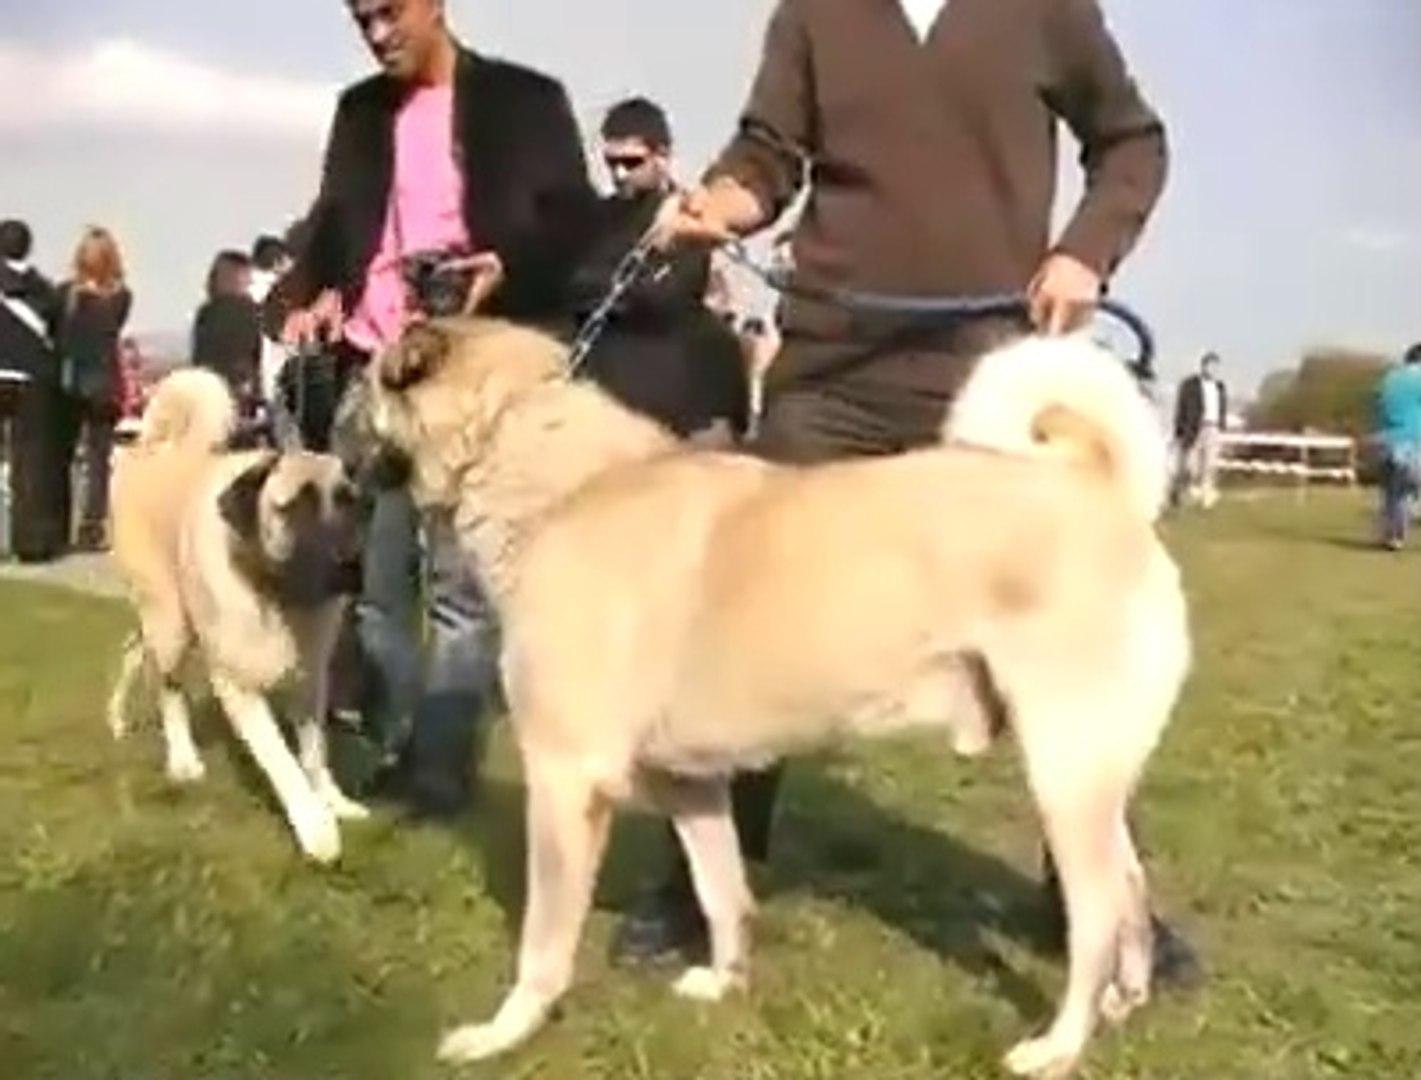 KOPEK YARISMASINDAKİ KANGALIN ASALETi - KANGAL SHEPHERD DOGS SHOW